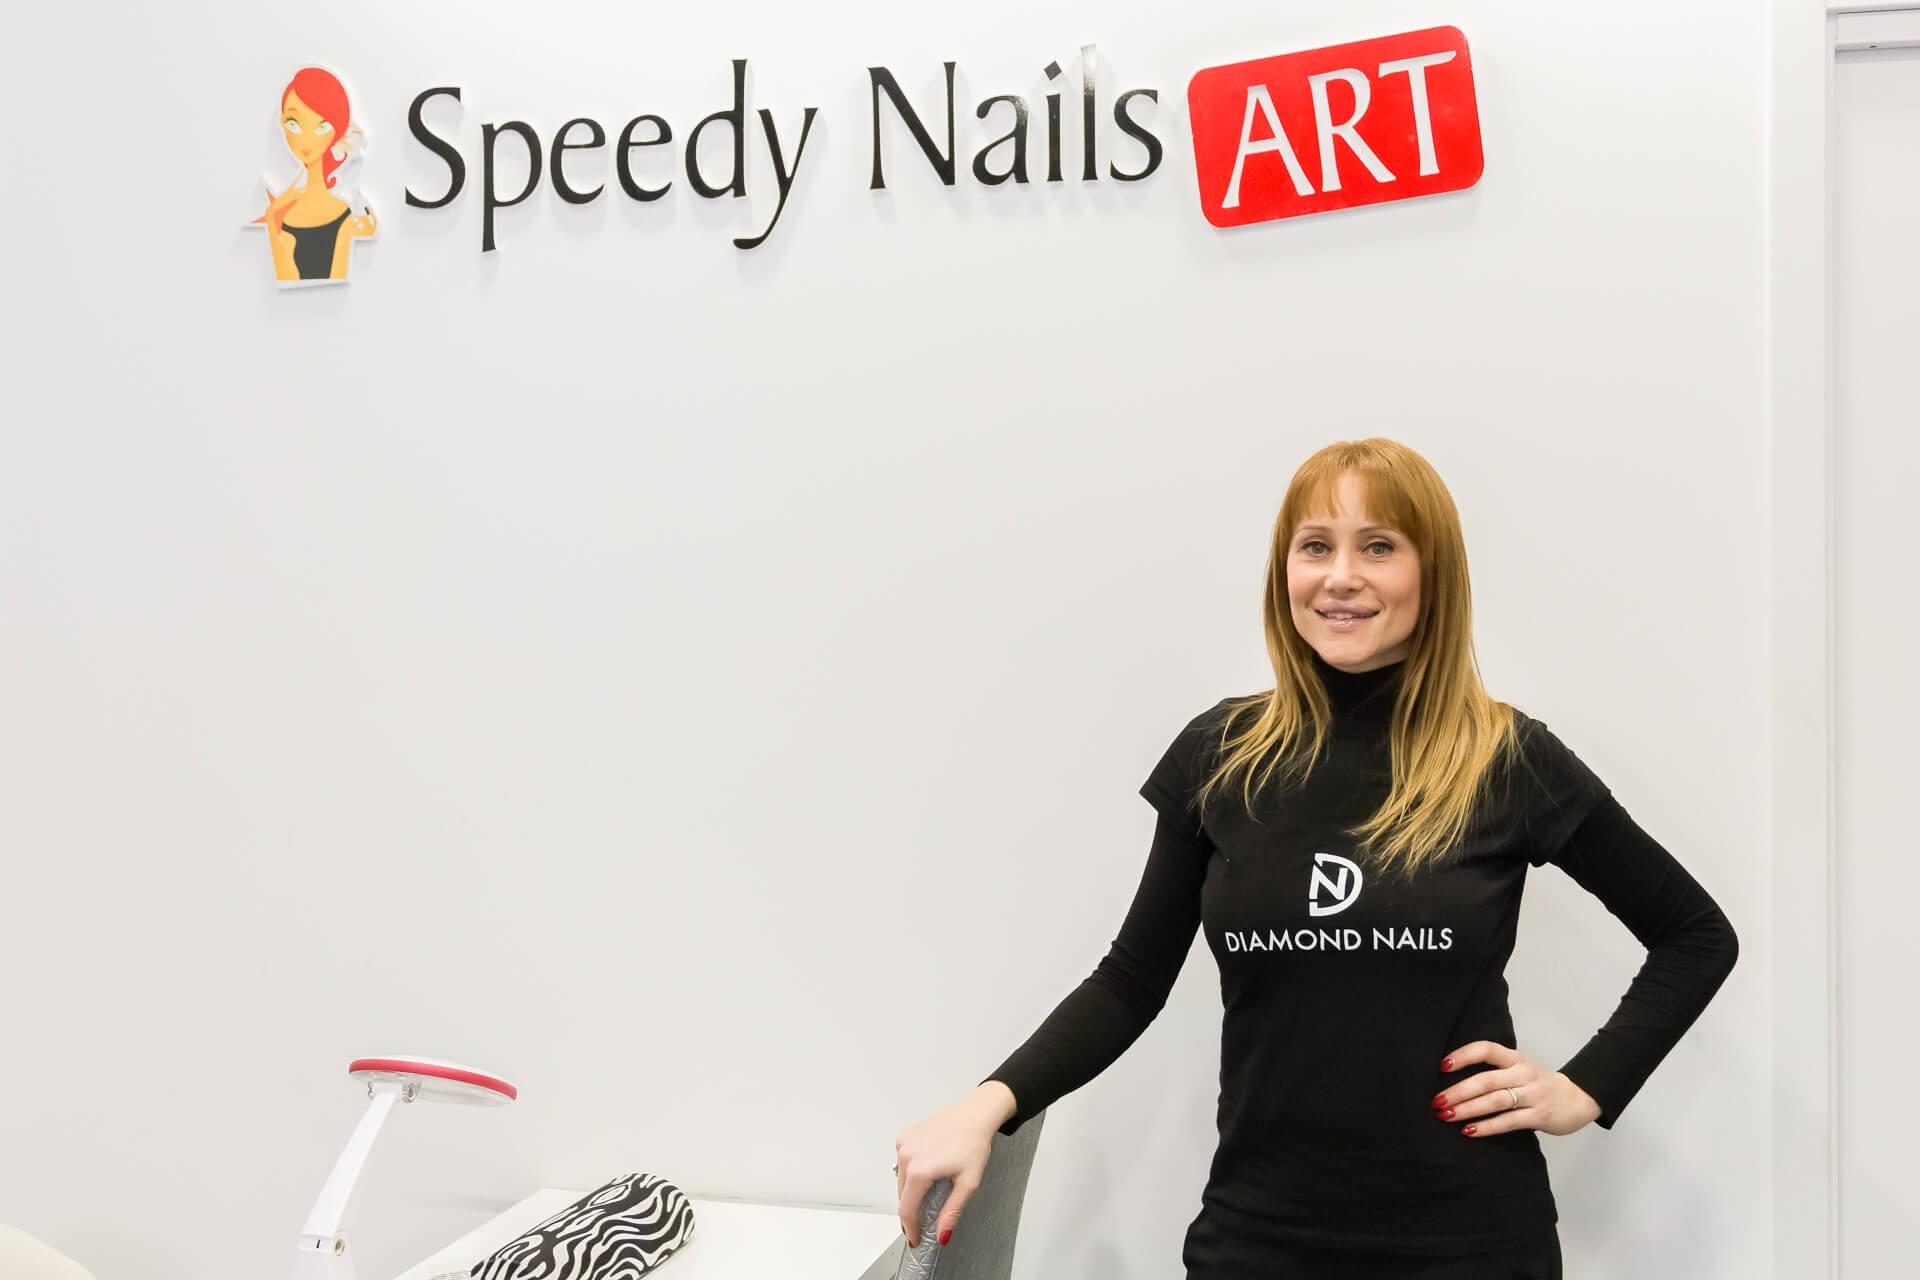 Speedy_Nails_Art_IT